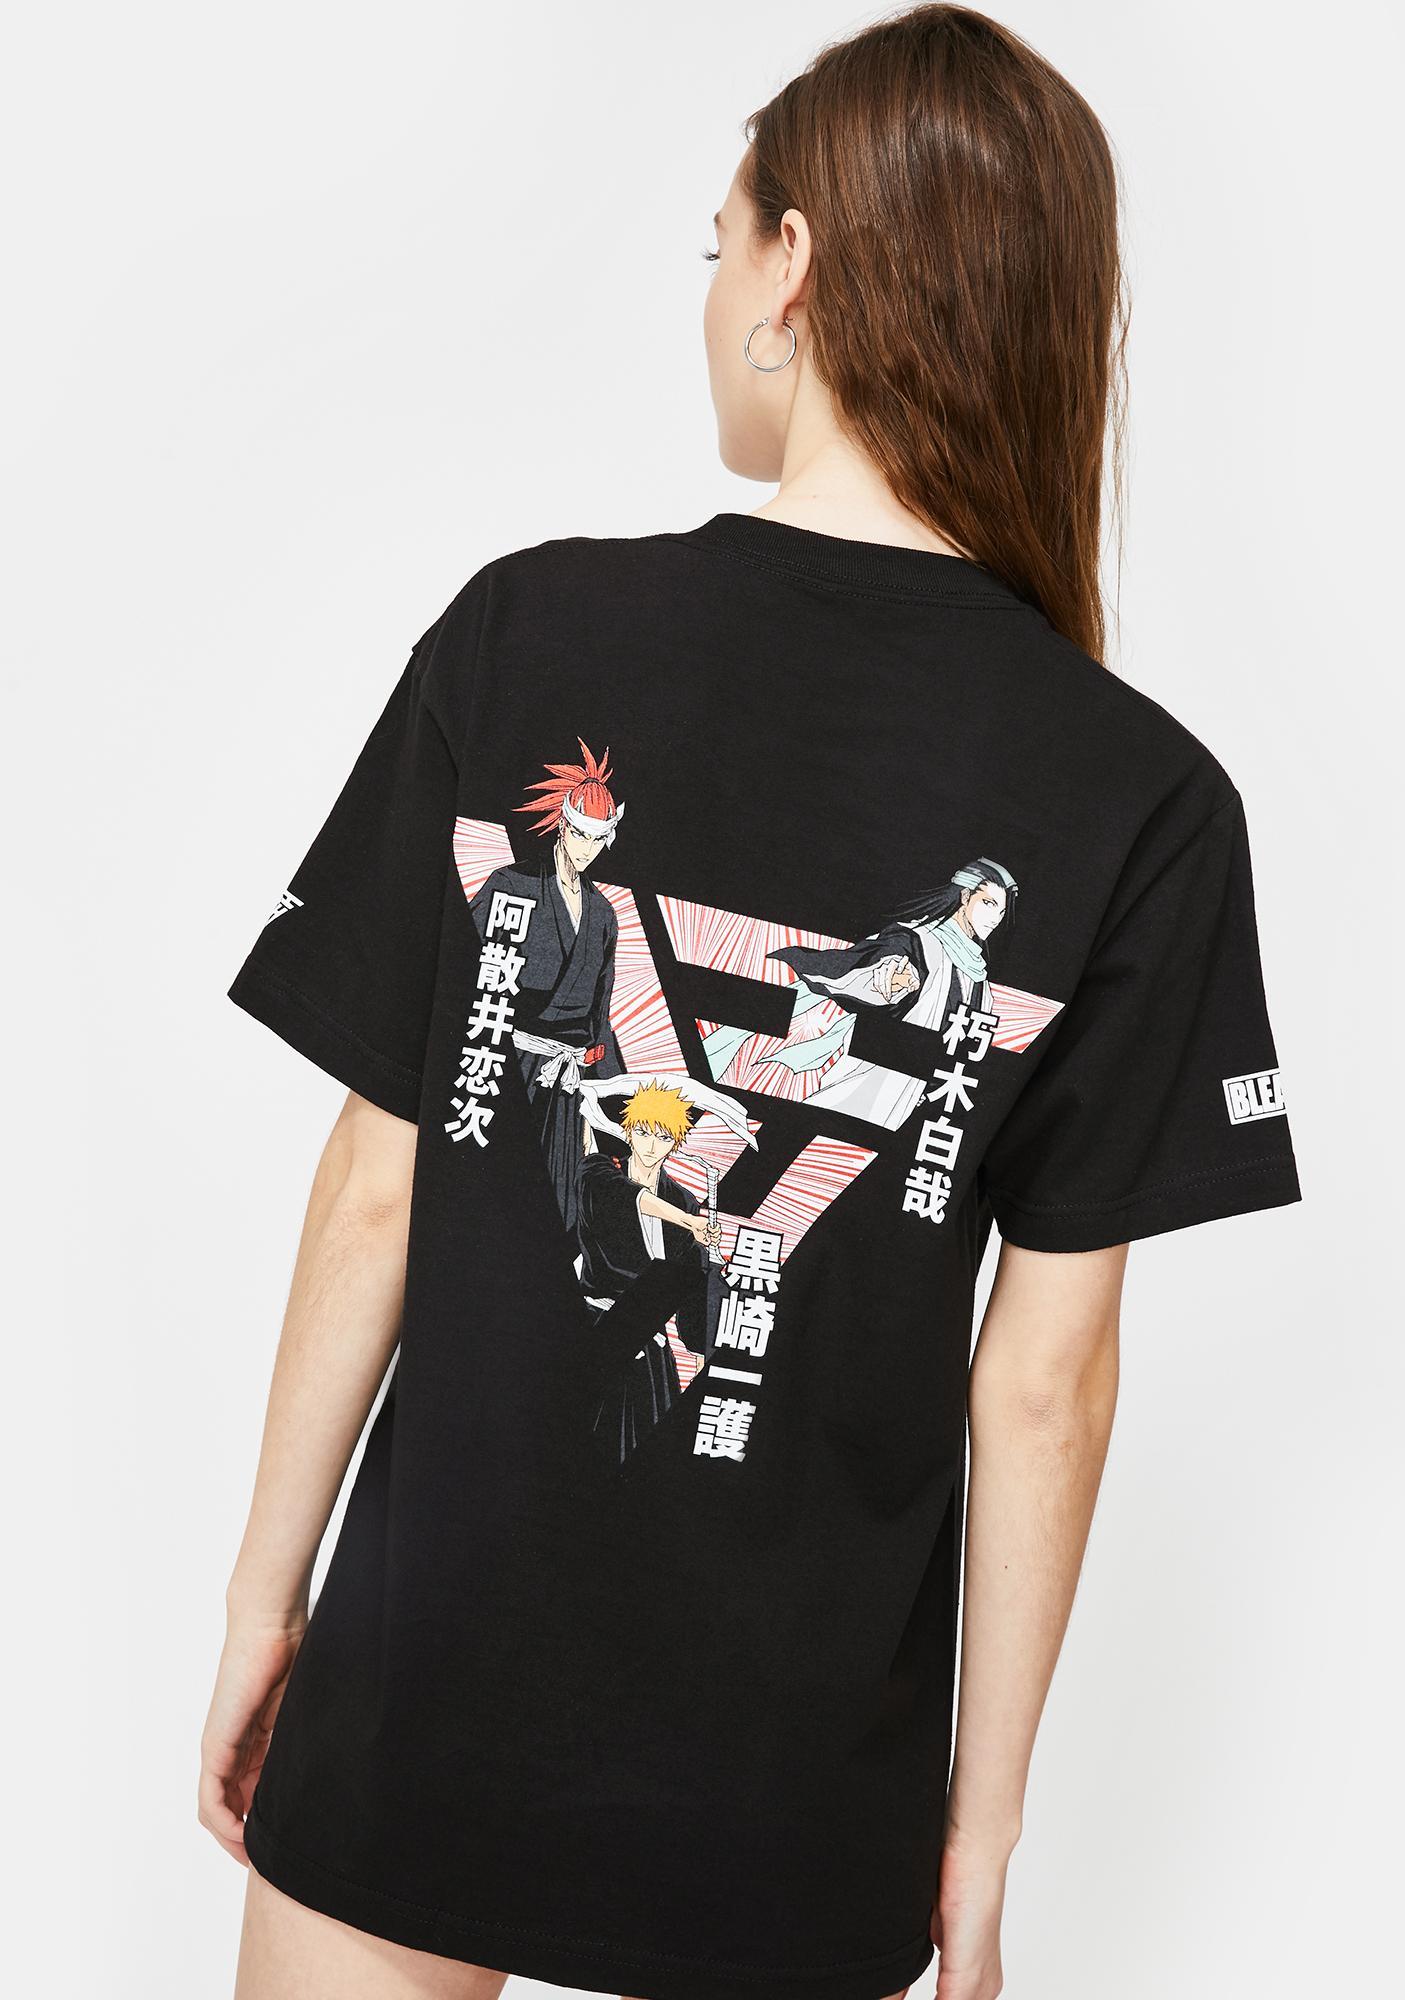 HYPLAND X Bleach Triple Threat Graphic Tee